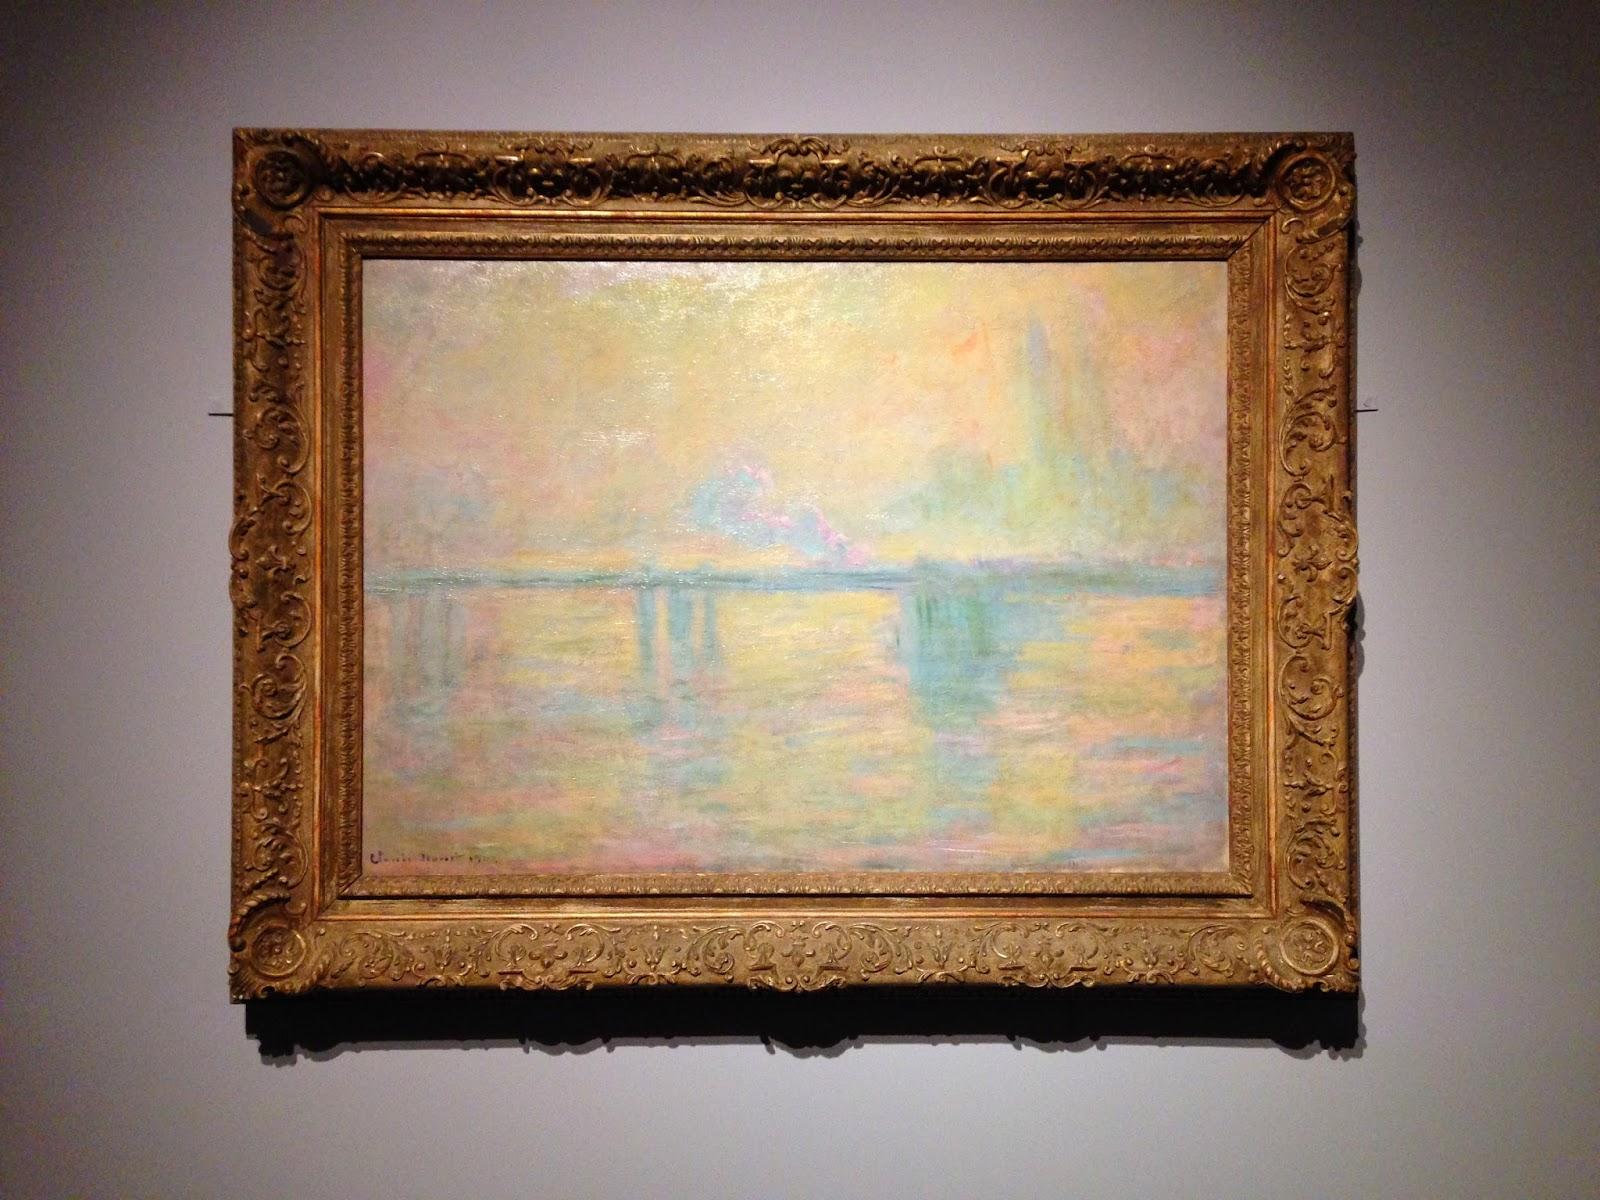 Museum of London Sherlock Holmes Monet